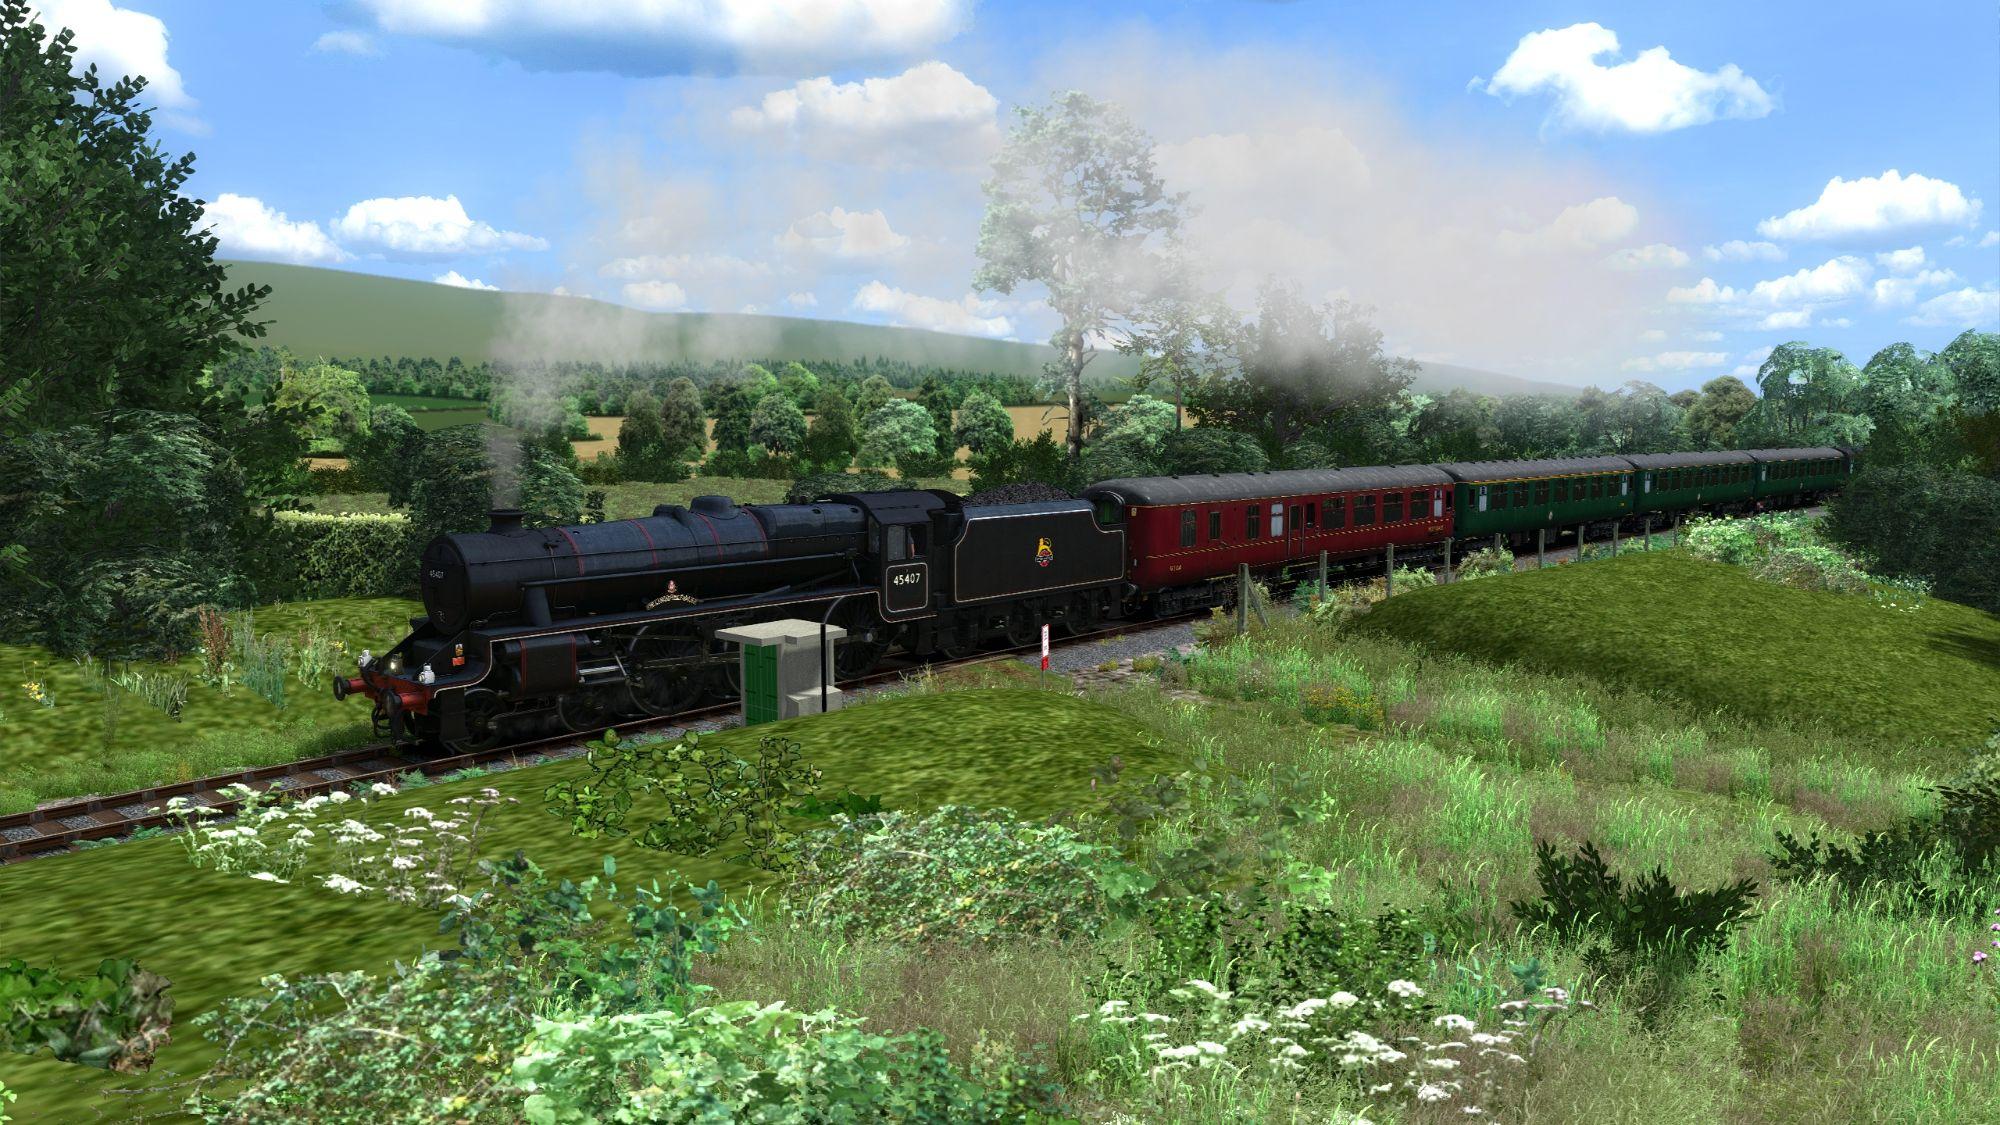 Screenshot_West Somerset Members Edition V4JLW_51.09461--3.22582_12-41-36.jpg